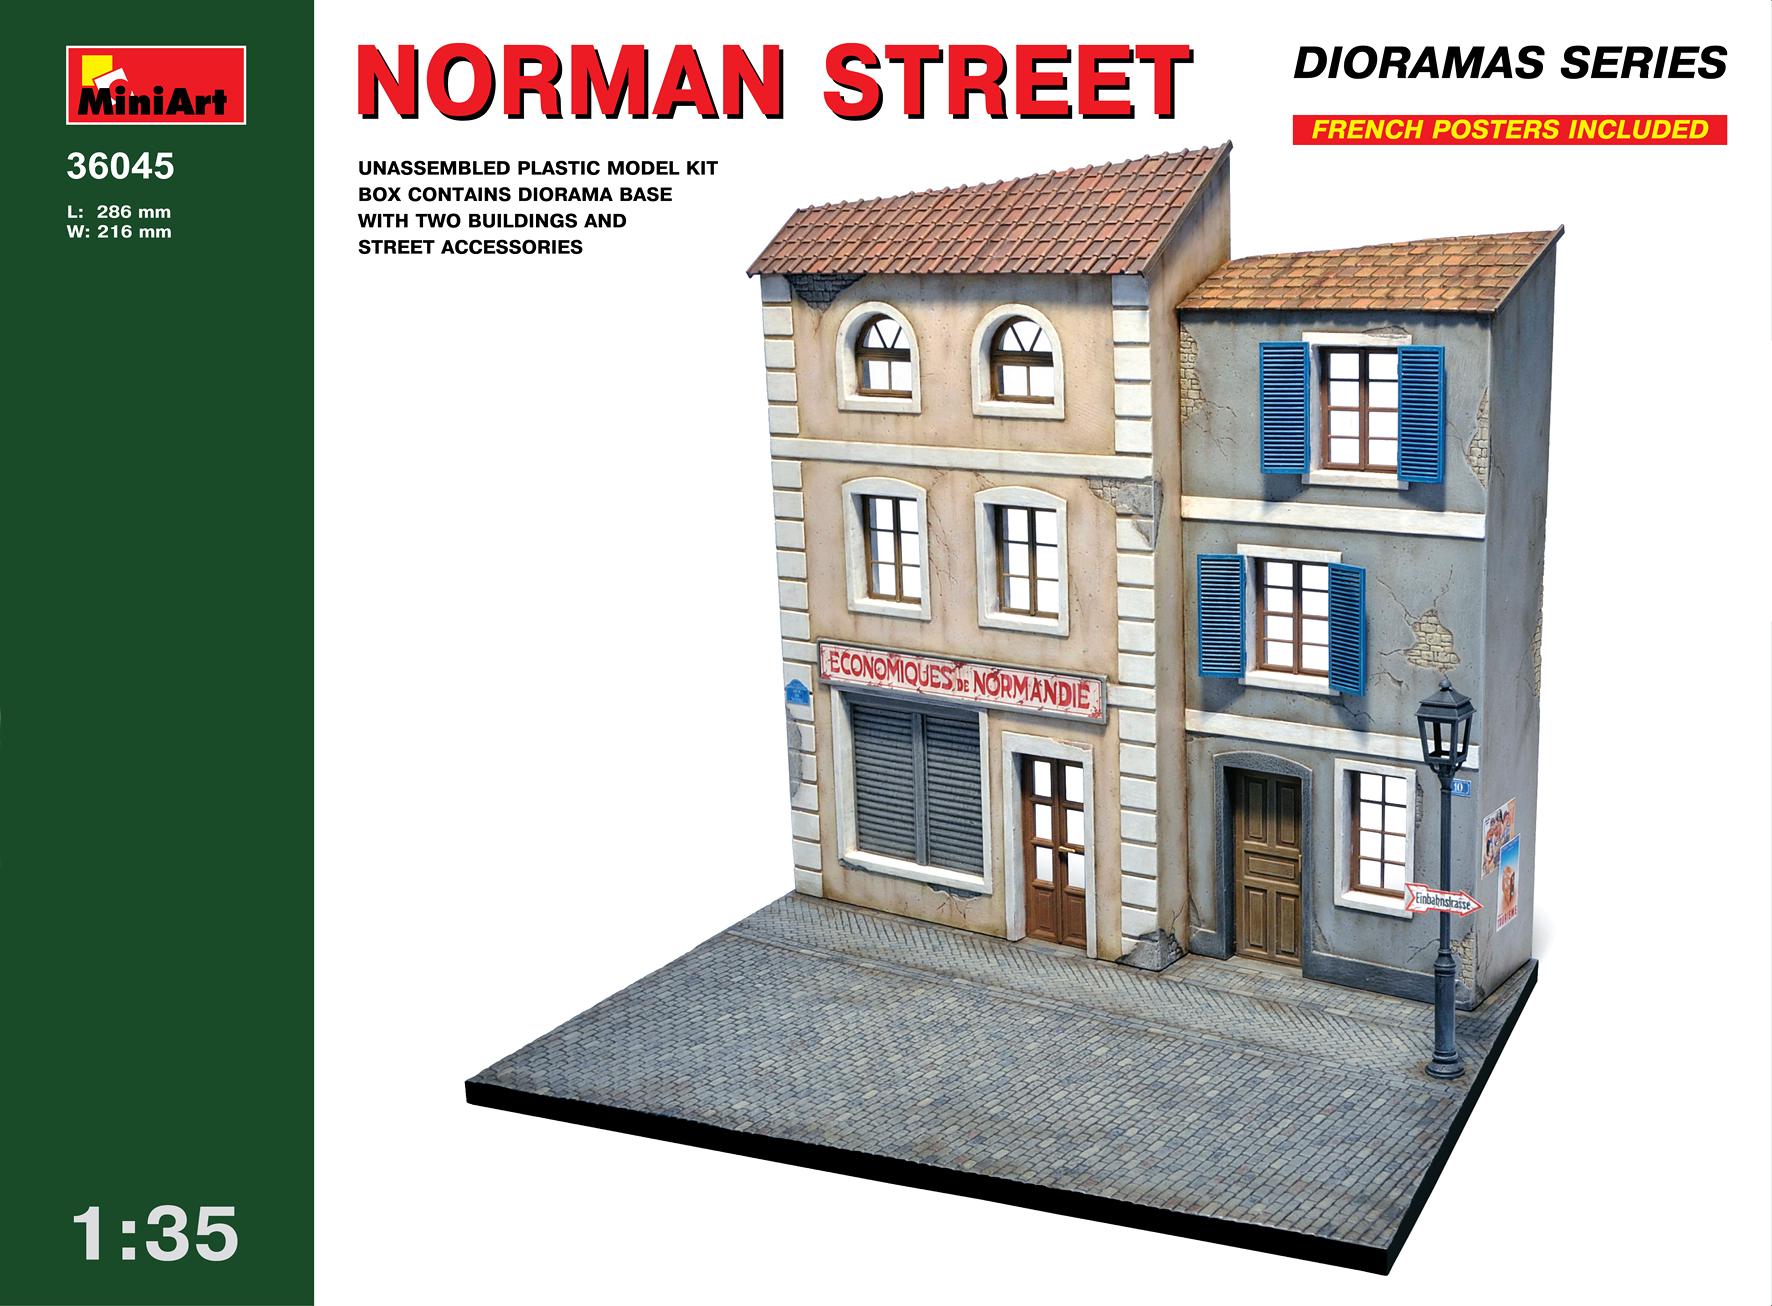 36045 NORMAN STREET